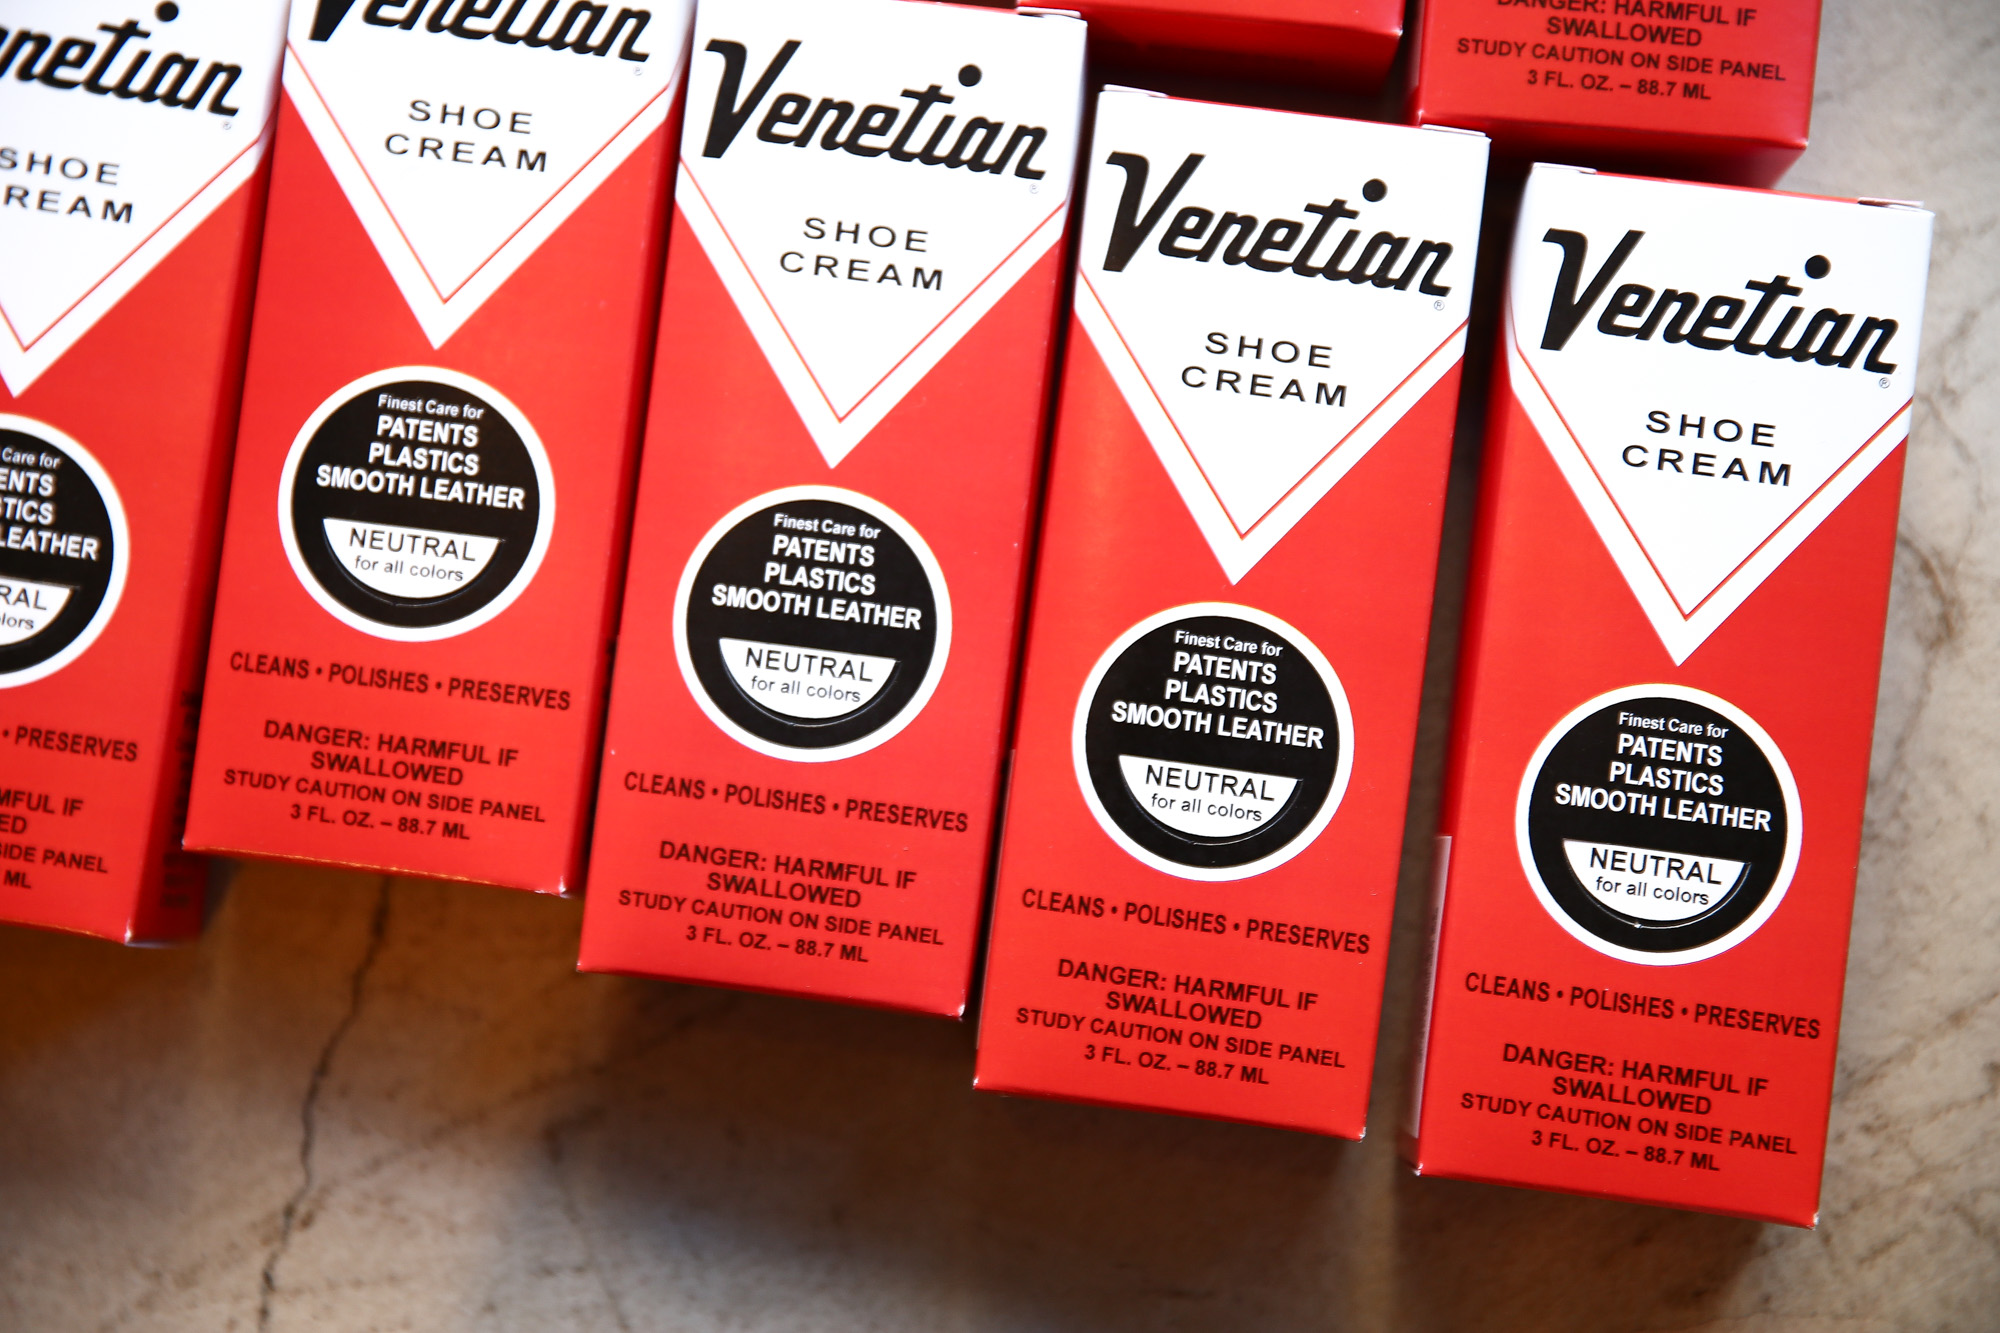 VENETIAN CREAM(ベネチアンクリーム) VENETIAN SHOE CREAM(ベネチアンシュークリーム) 3oz (74ml) 乳化性クリーム シューケア シュークリーム NEUTRAL(ニュートラル・無色) MADE IN USA(アメリカ製) venetiancream ベネチアンクリーム コードバン 愛知 名古屋 Alto e Diritto アルト エ デリット